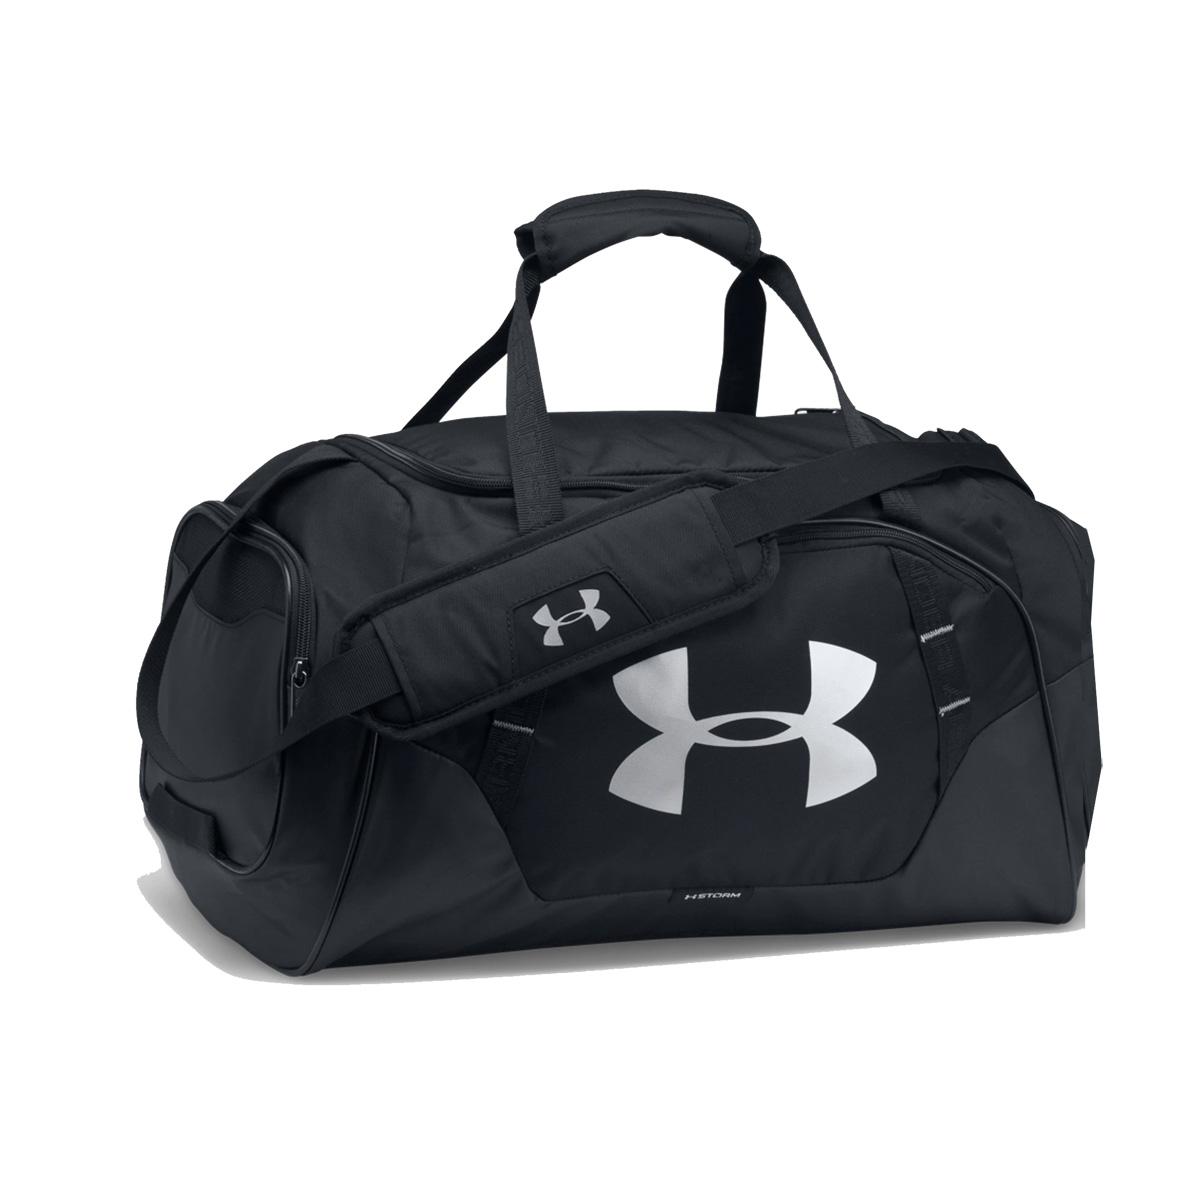 Under Armour Undeniable 3.0 Small Duffel Bag - Black  a39e16312d3ce